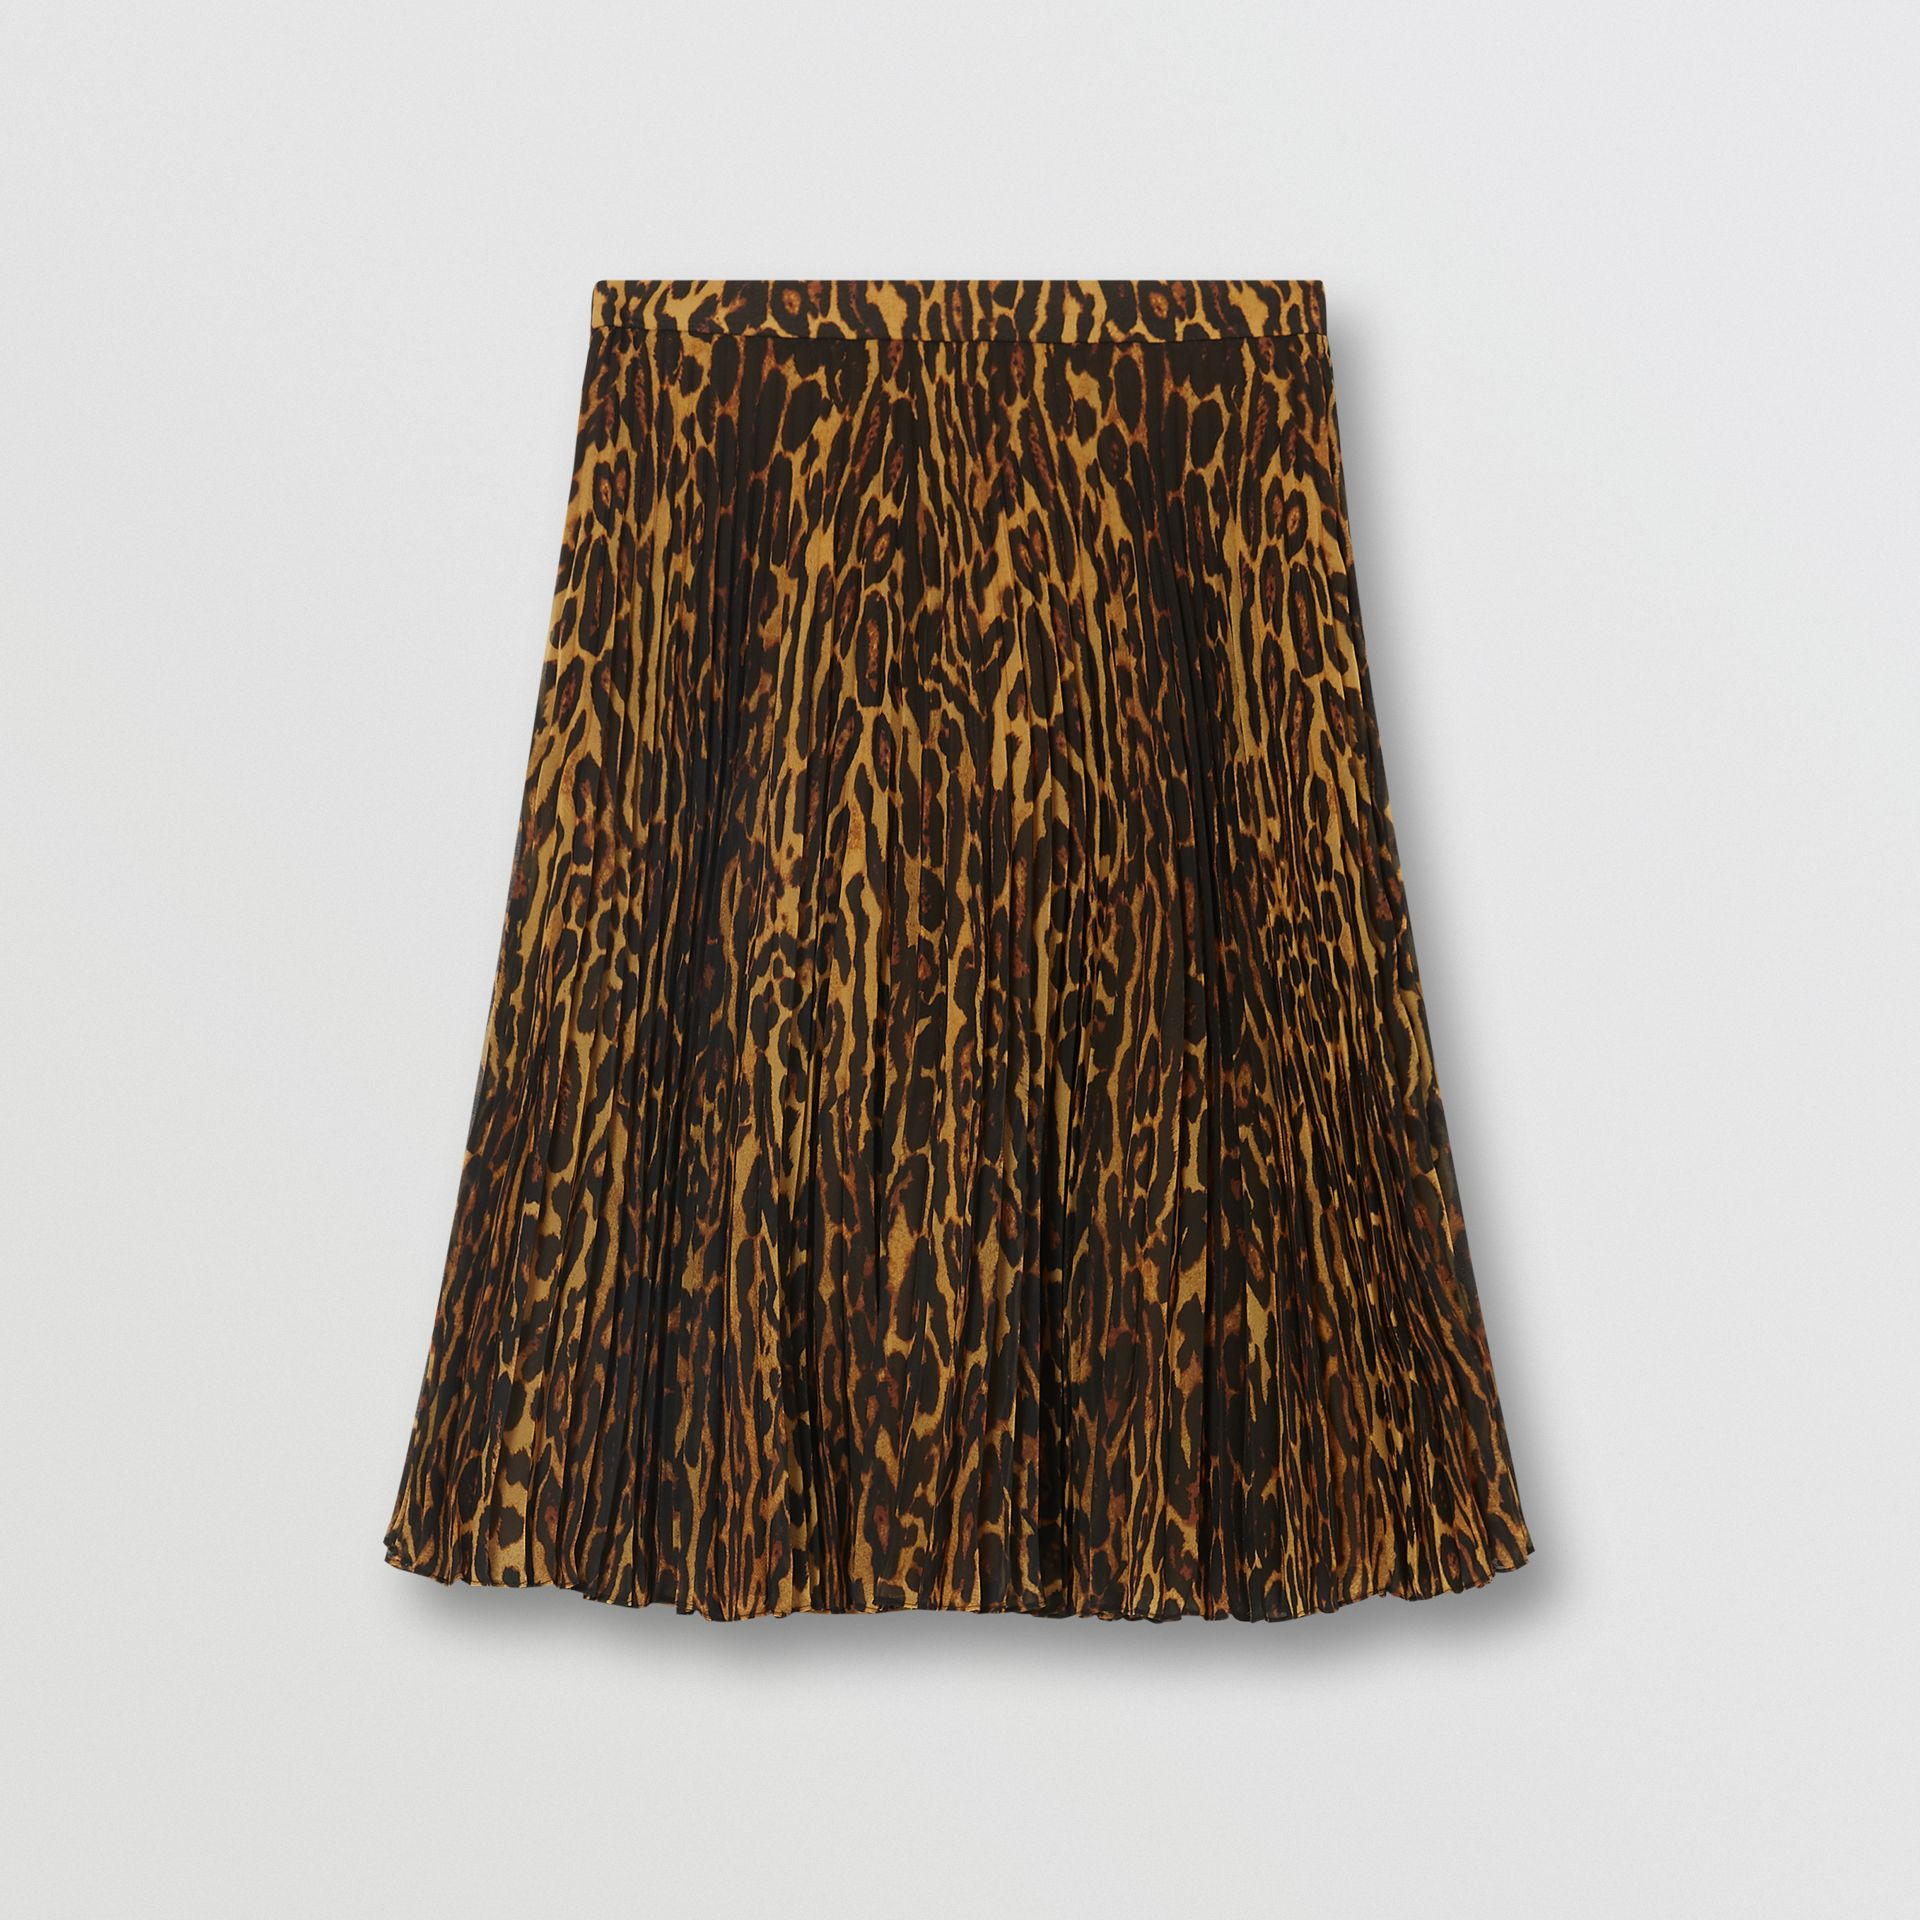 Leopard Print Pleated Skirt in Dark Mustard - Women | Burberry Hong Kong S.A.R - gallery image 3